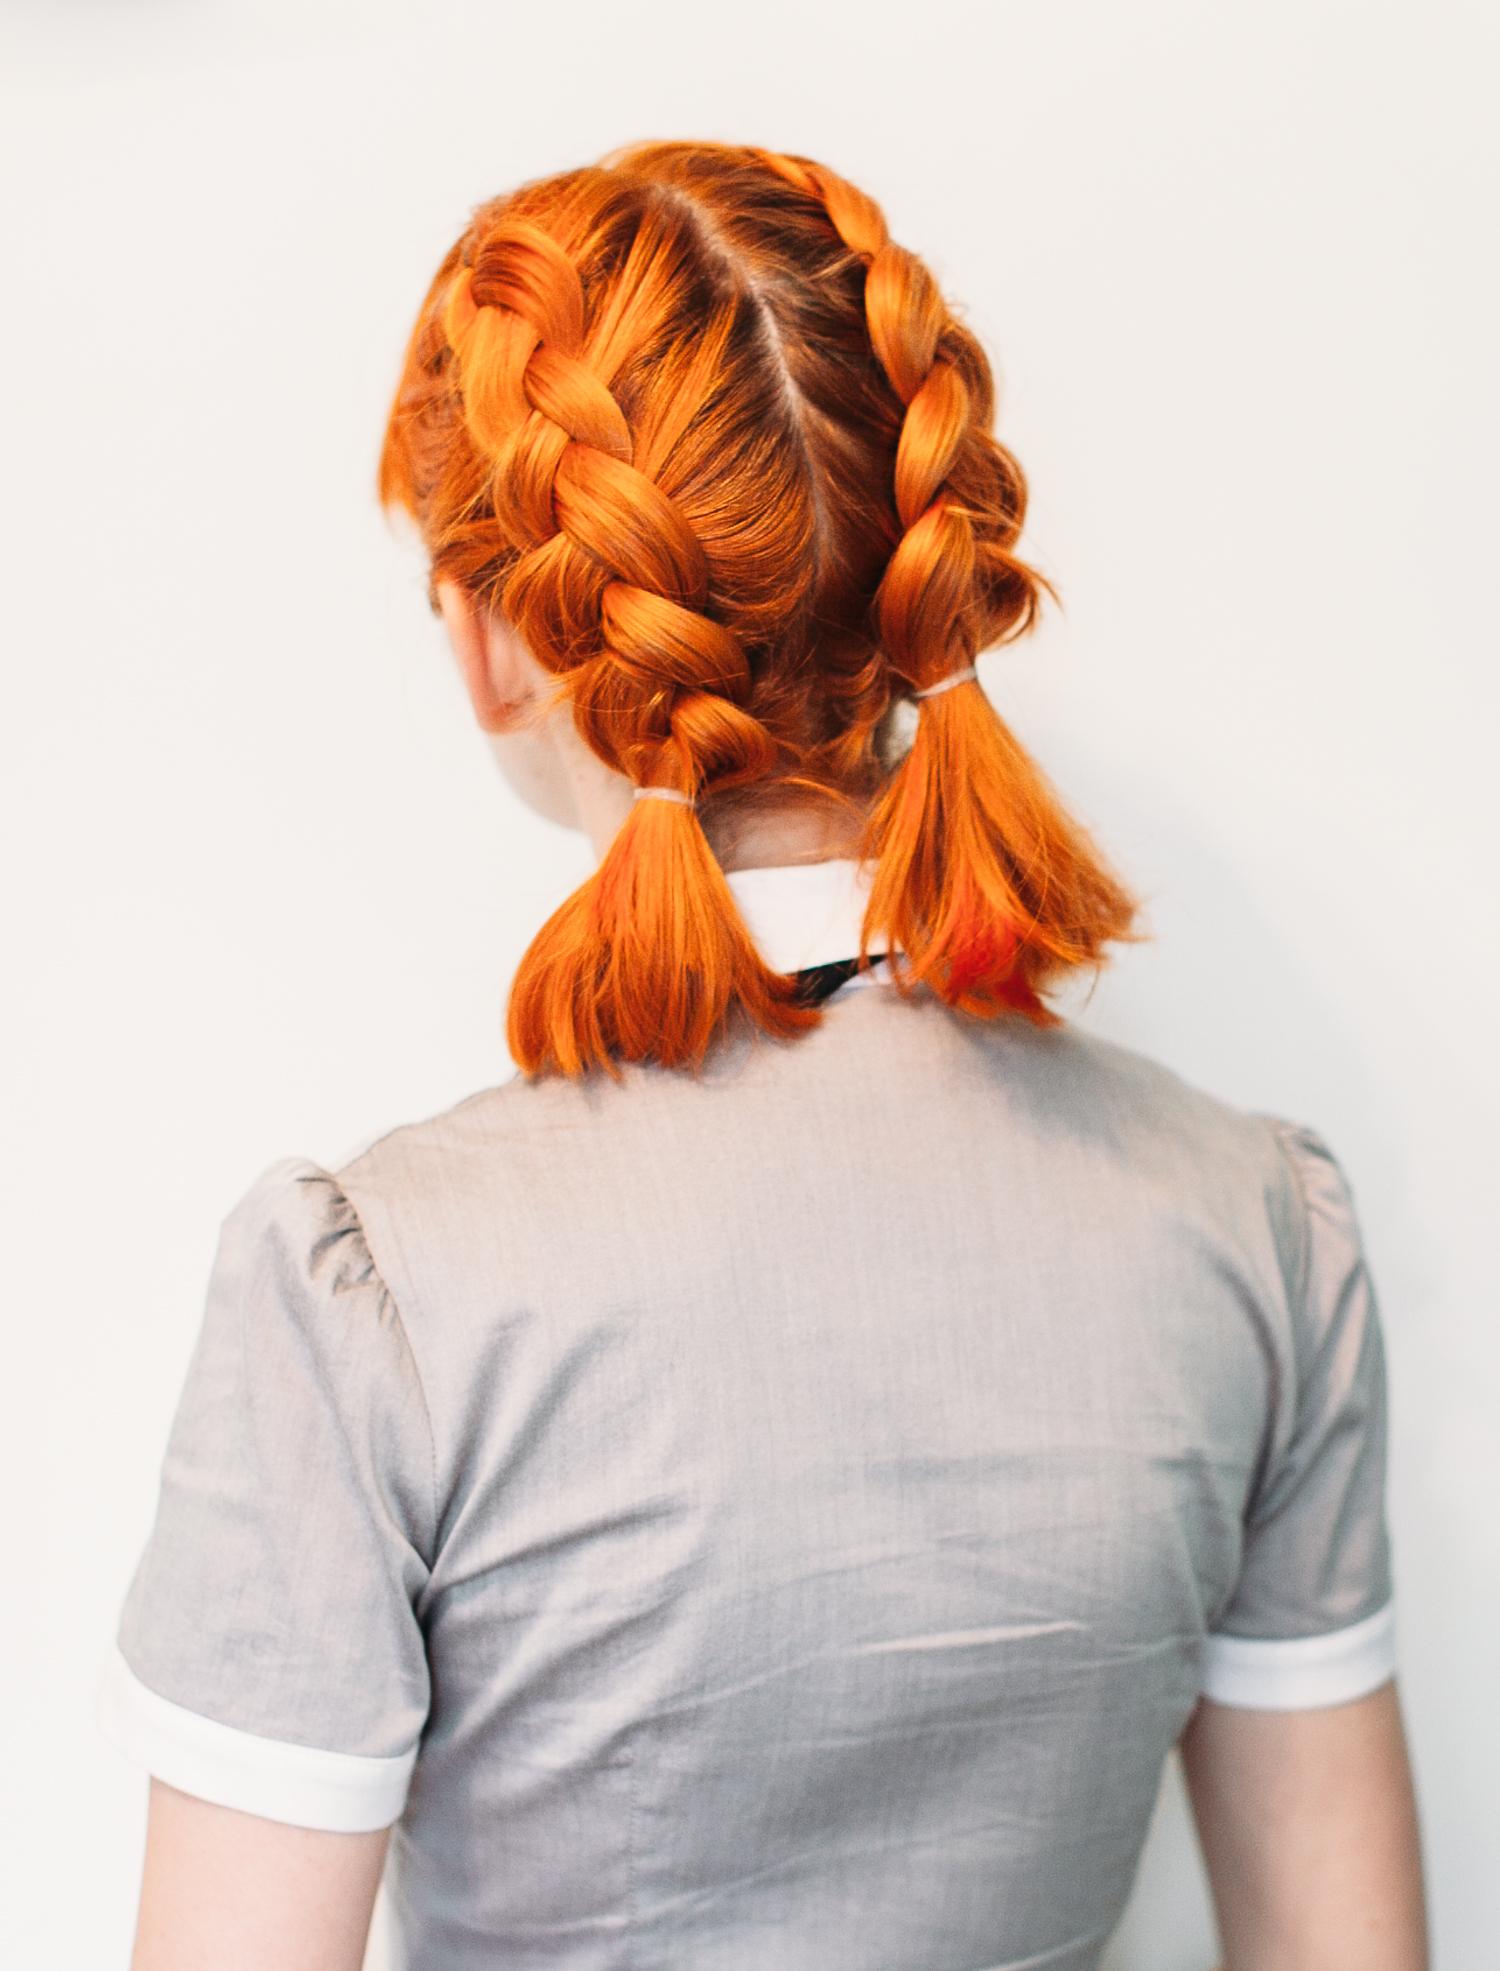 Neon-Orange-Short-Bob Braids Hairstyles 2020 for Ultra Stylish Looks